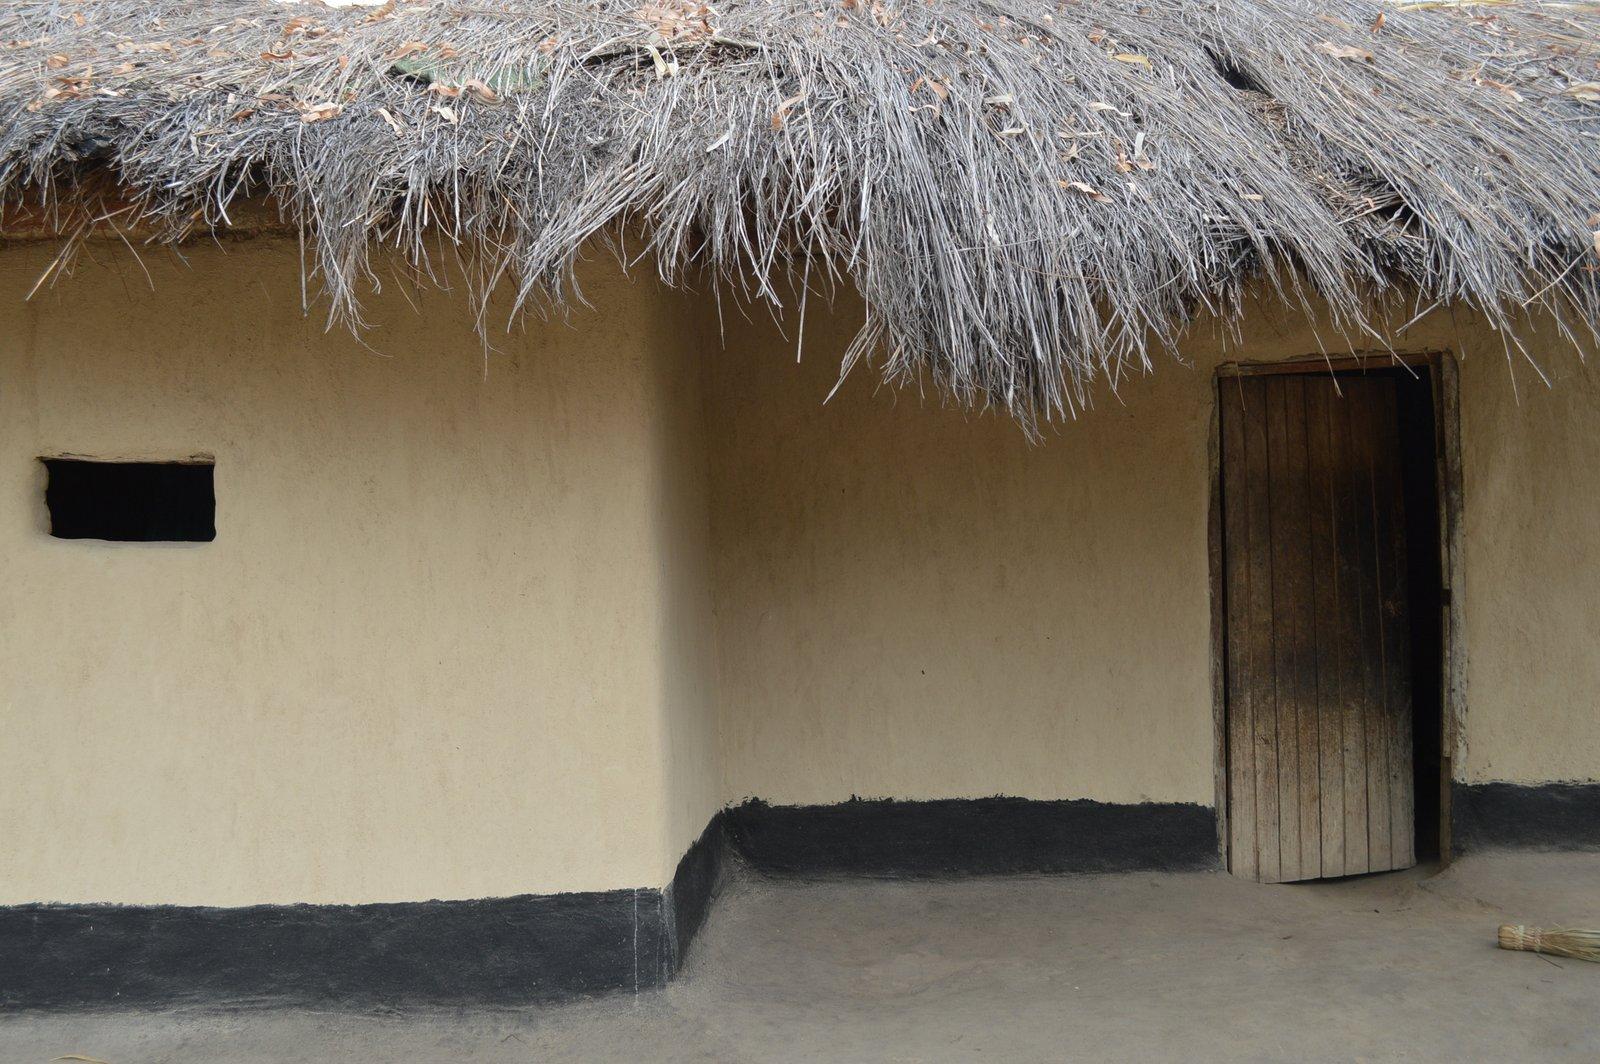 Choveka, Nkhata Bay (2).JPG